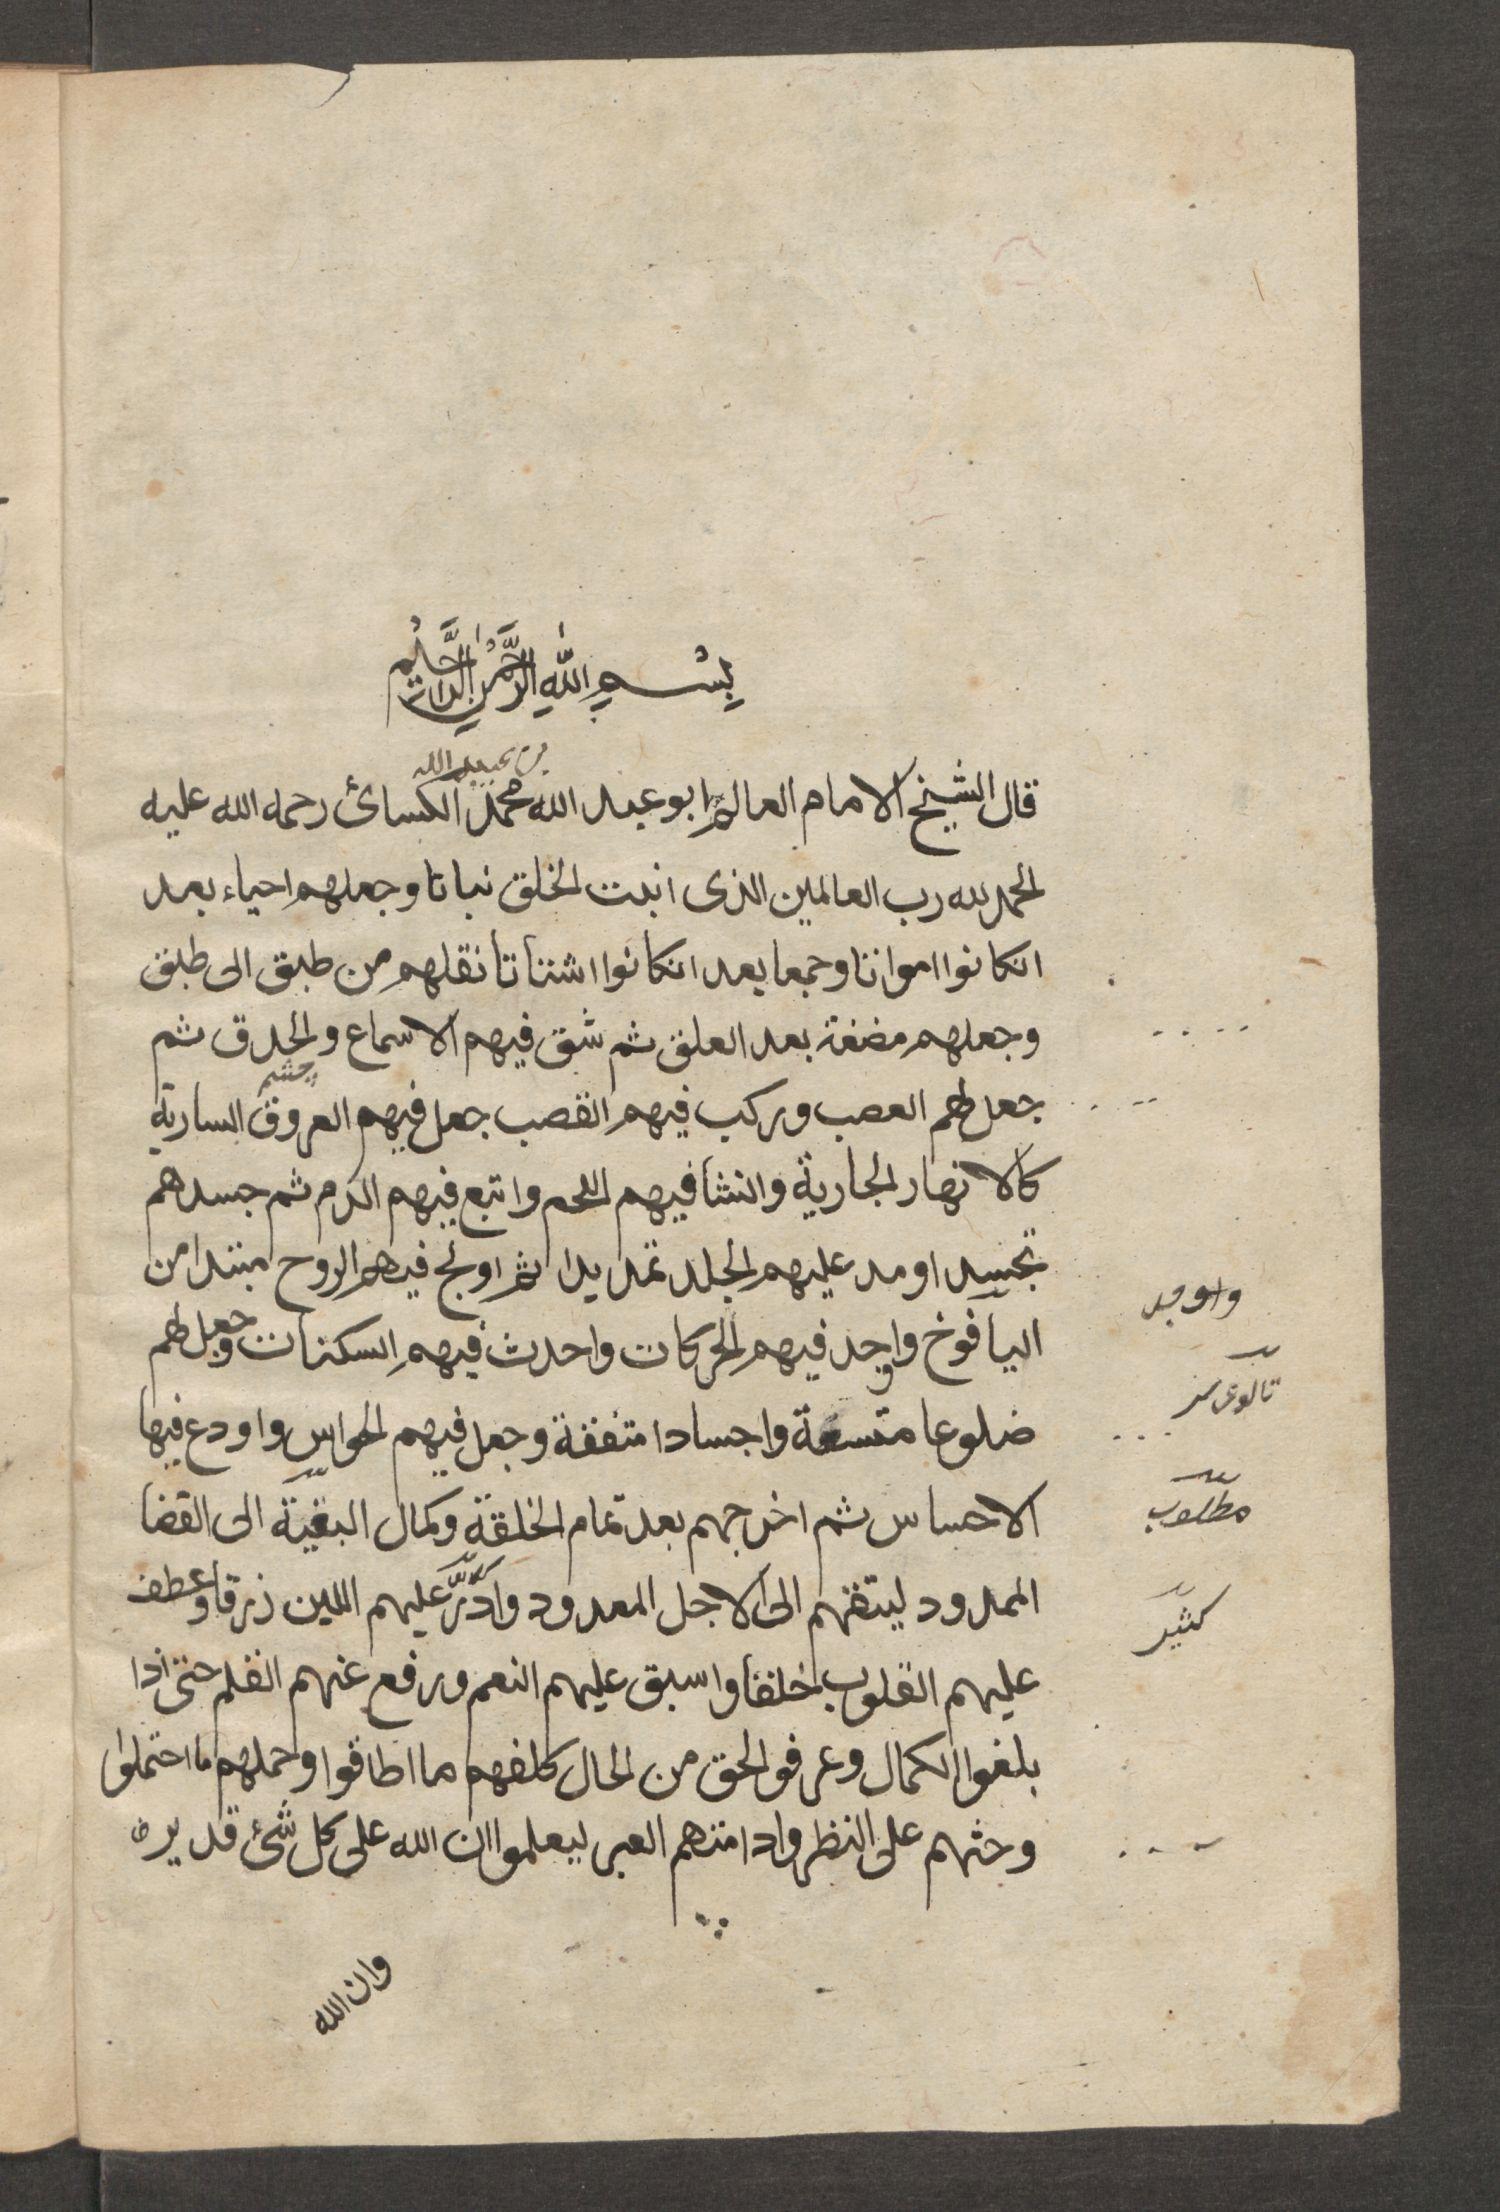 Anfang des Textes in arabischer Schrift